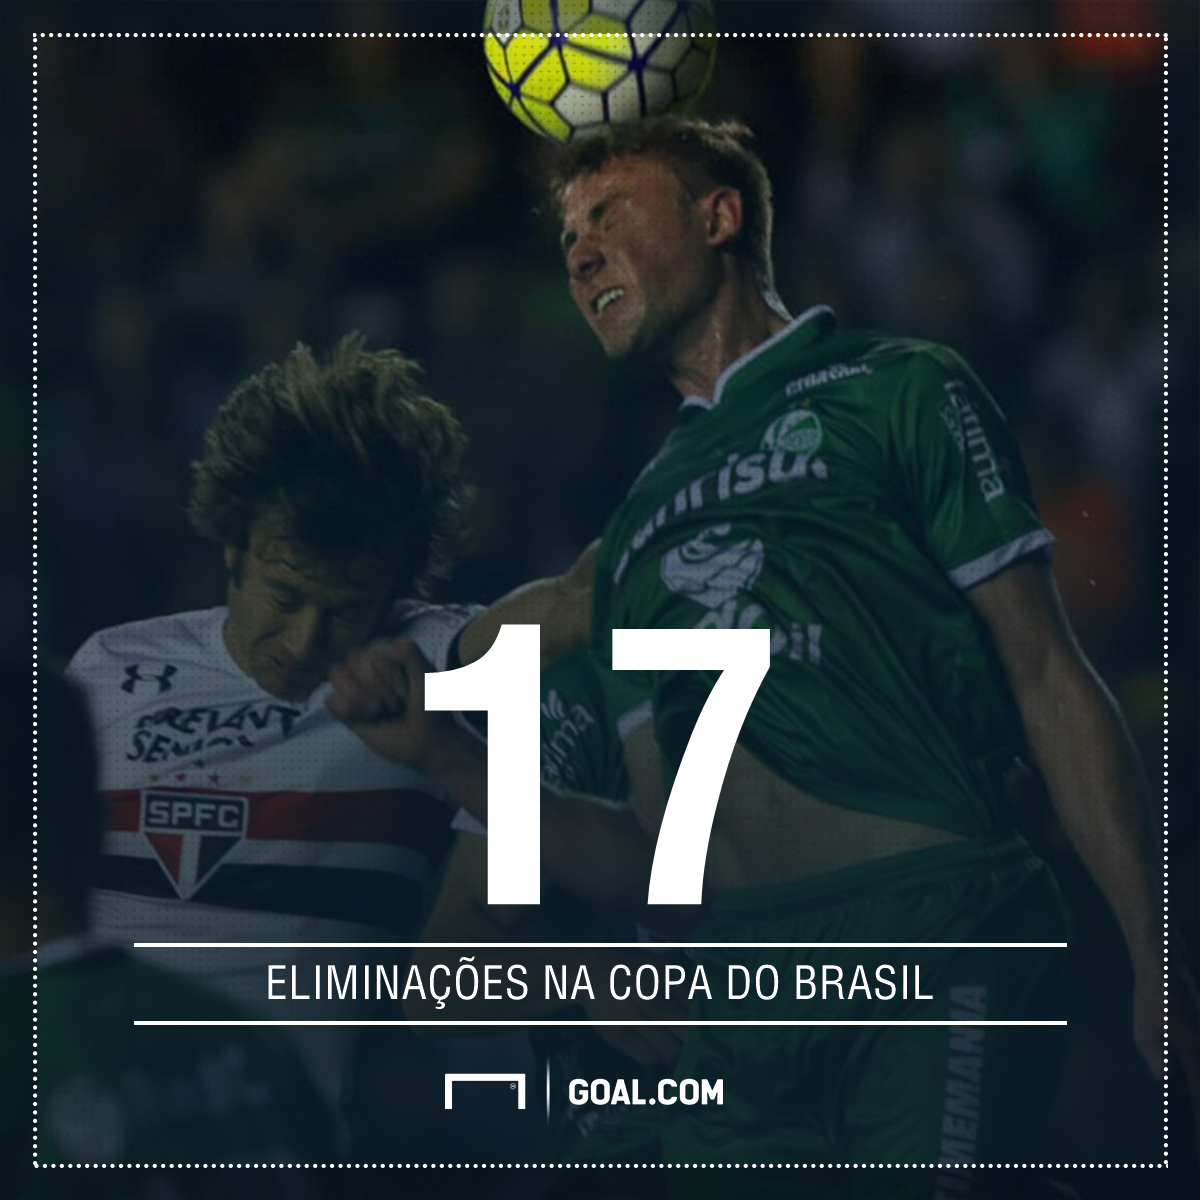 Confrontos definidos nas oitavas de final da Copa do Brasil